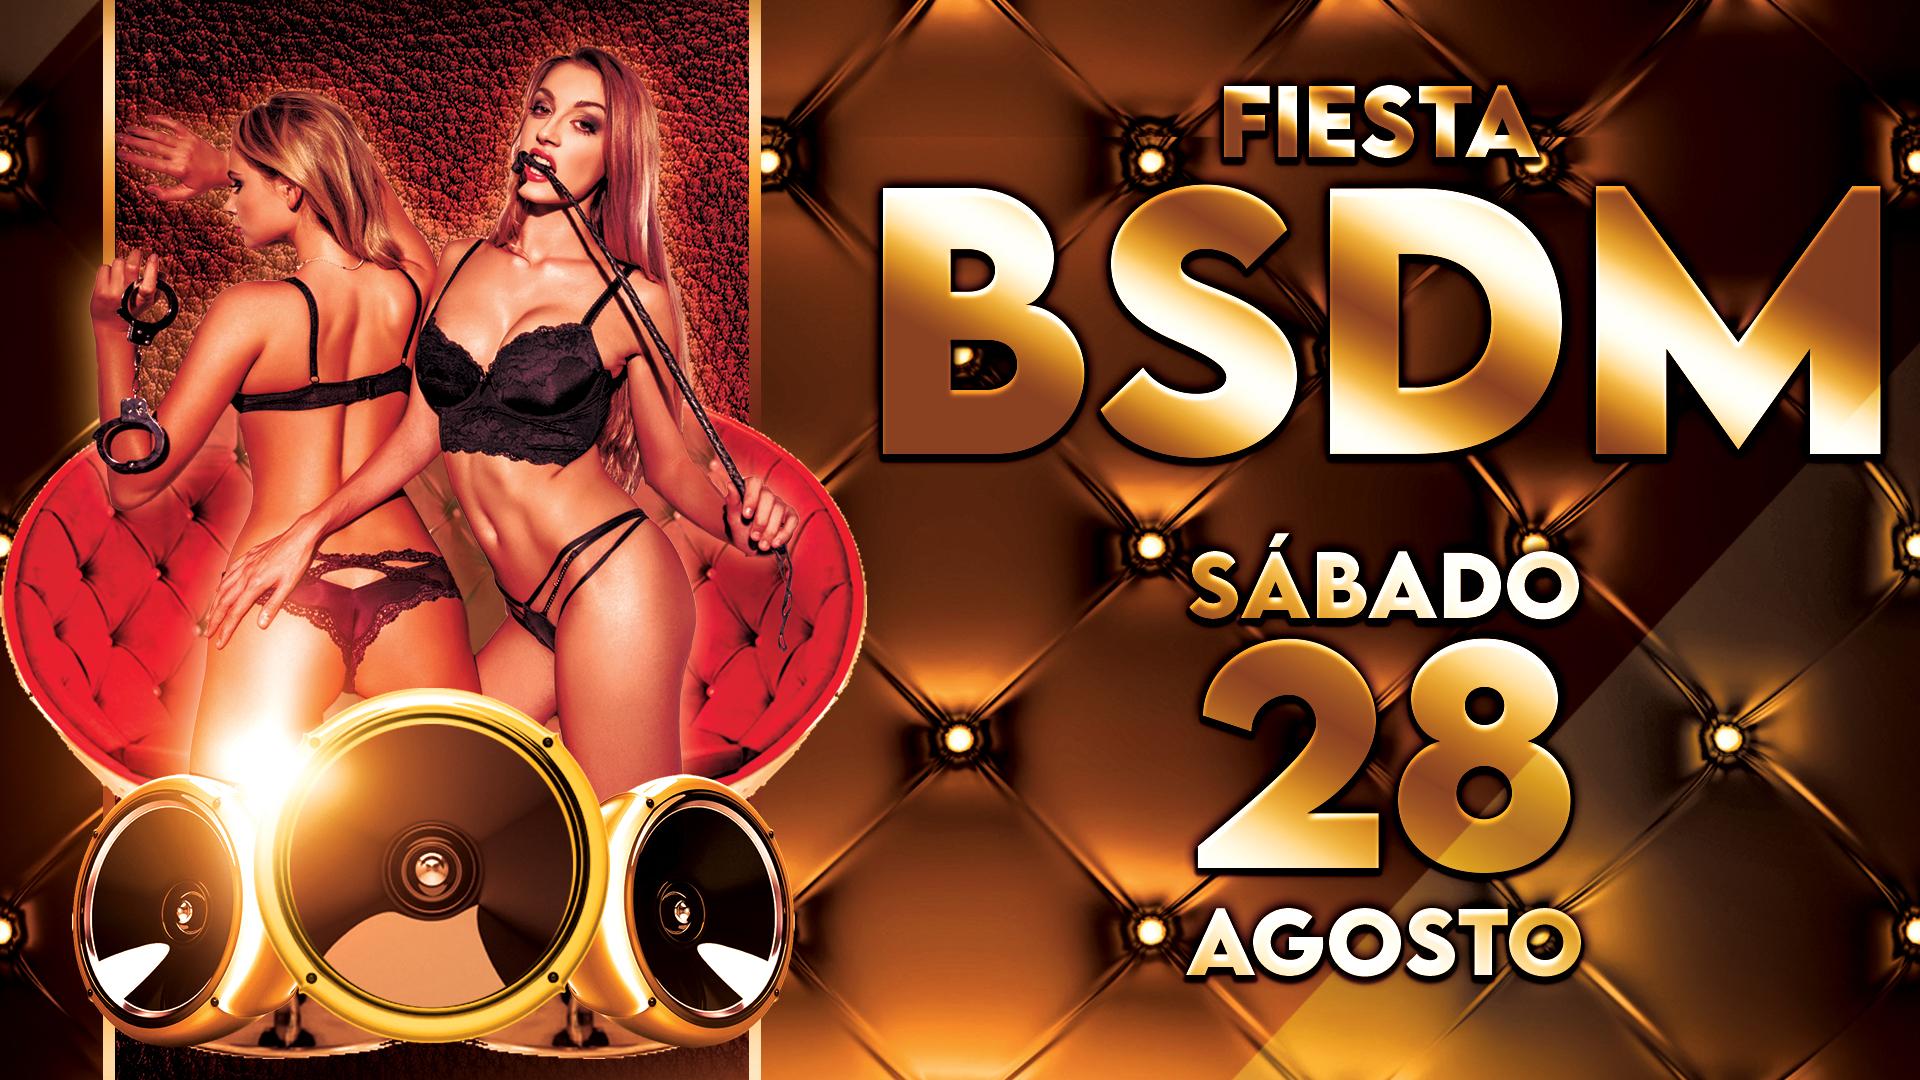 Fiesta BSDM Liberal, Tentación Swinger Torremolinos